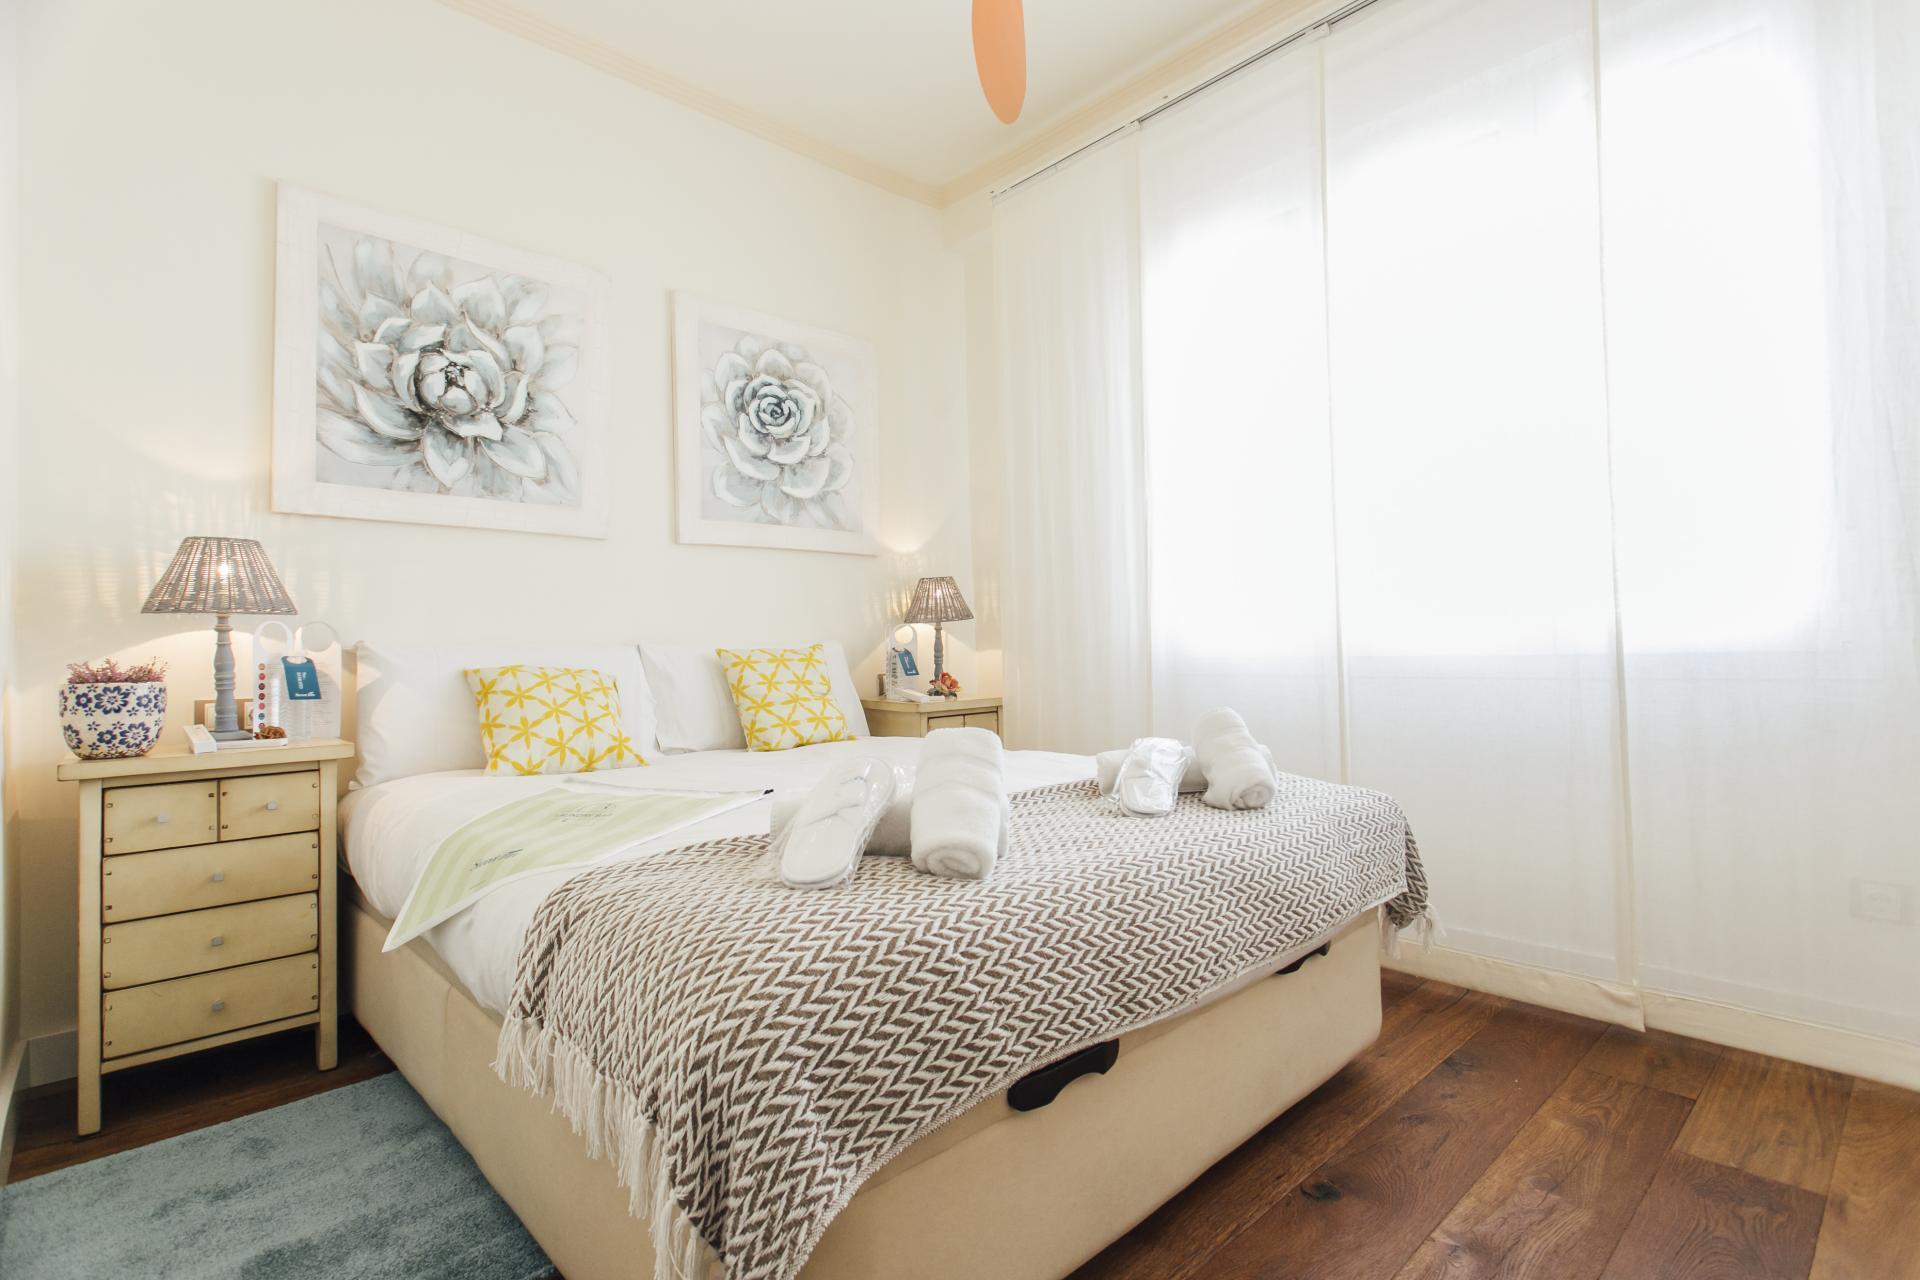 Bedroom at Arjona Apartment, Centre, Seville